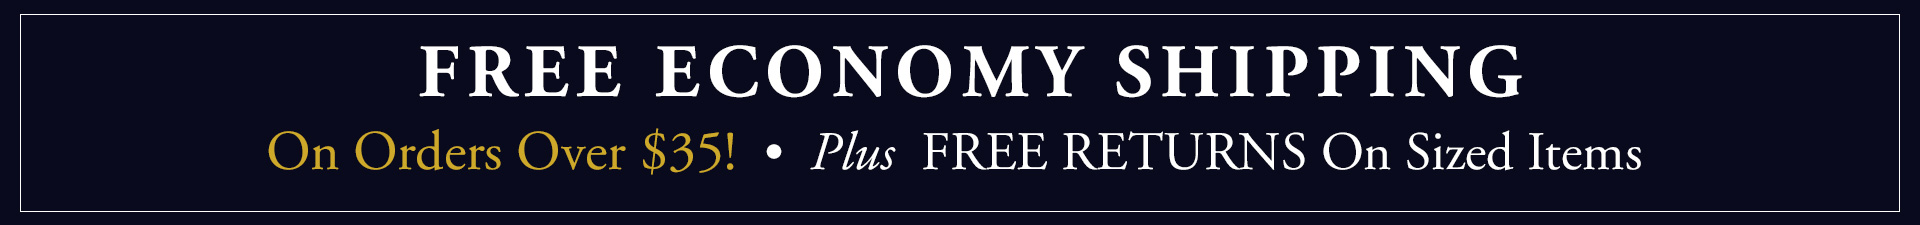 Free Economy Shipping